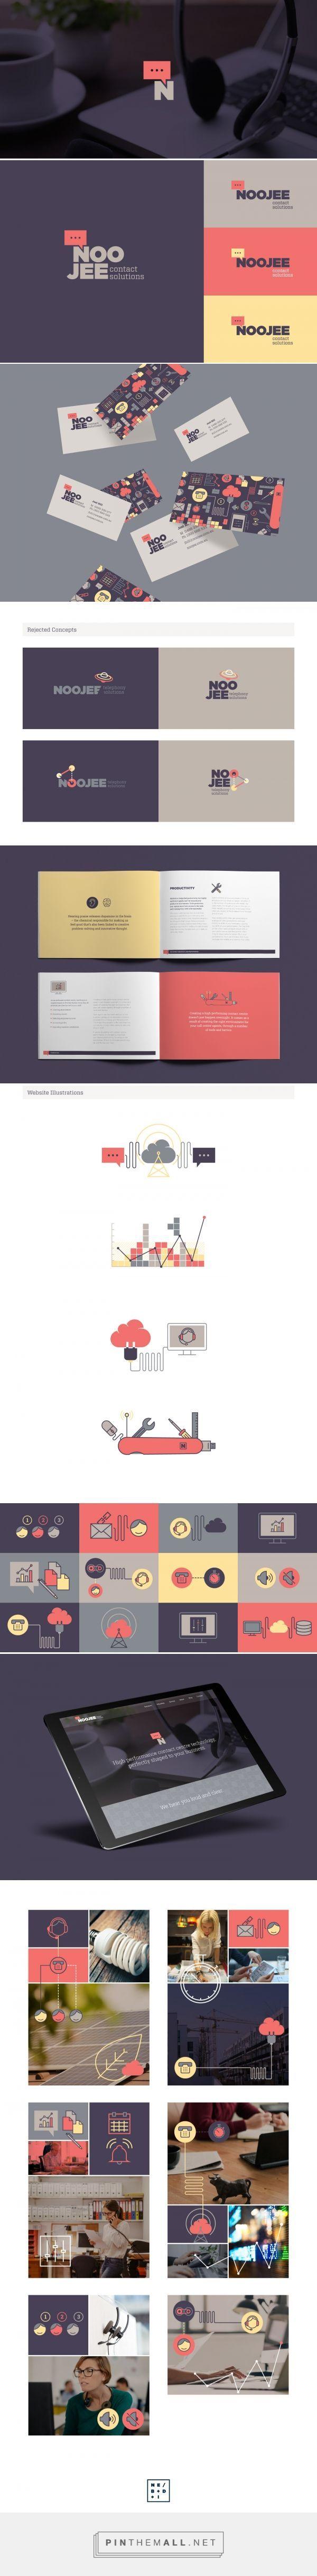 Noojee Branding by Nick Edlin on Behance | Fivestar Branding – Design and Branding Agency & Inspiration Gallery